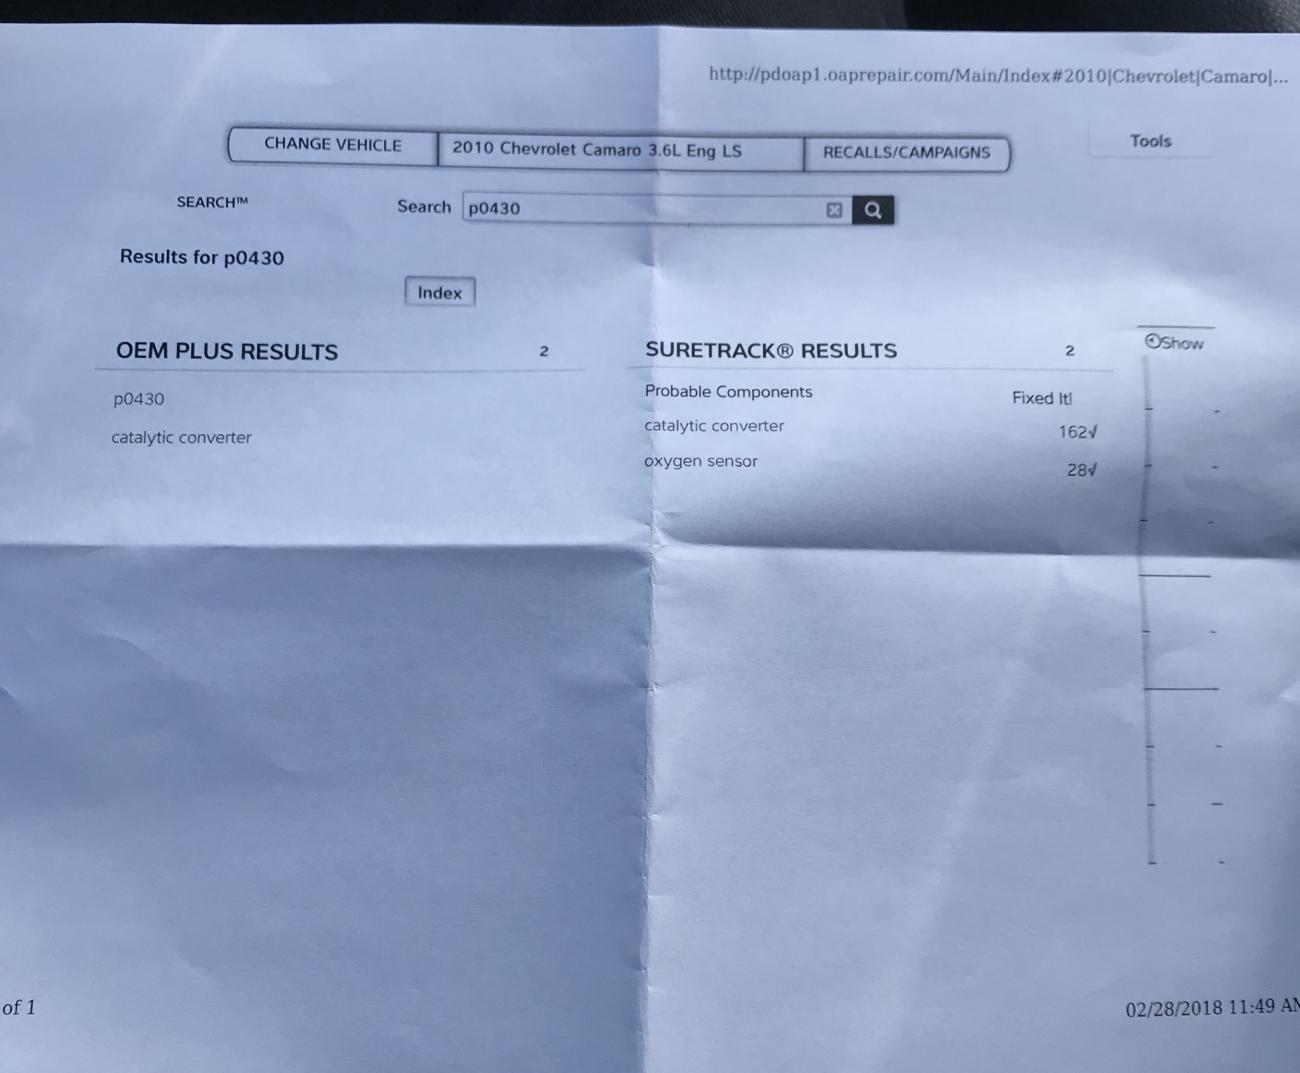 Check engine light - pulled code p0430 - Camaro5 Chevy Camaro Forum